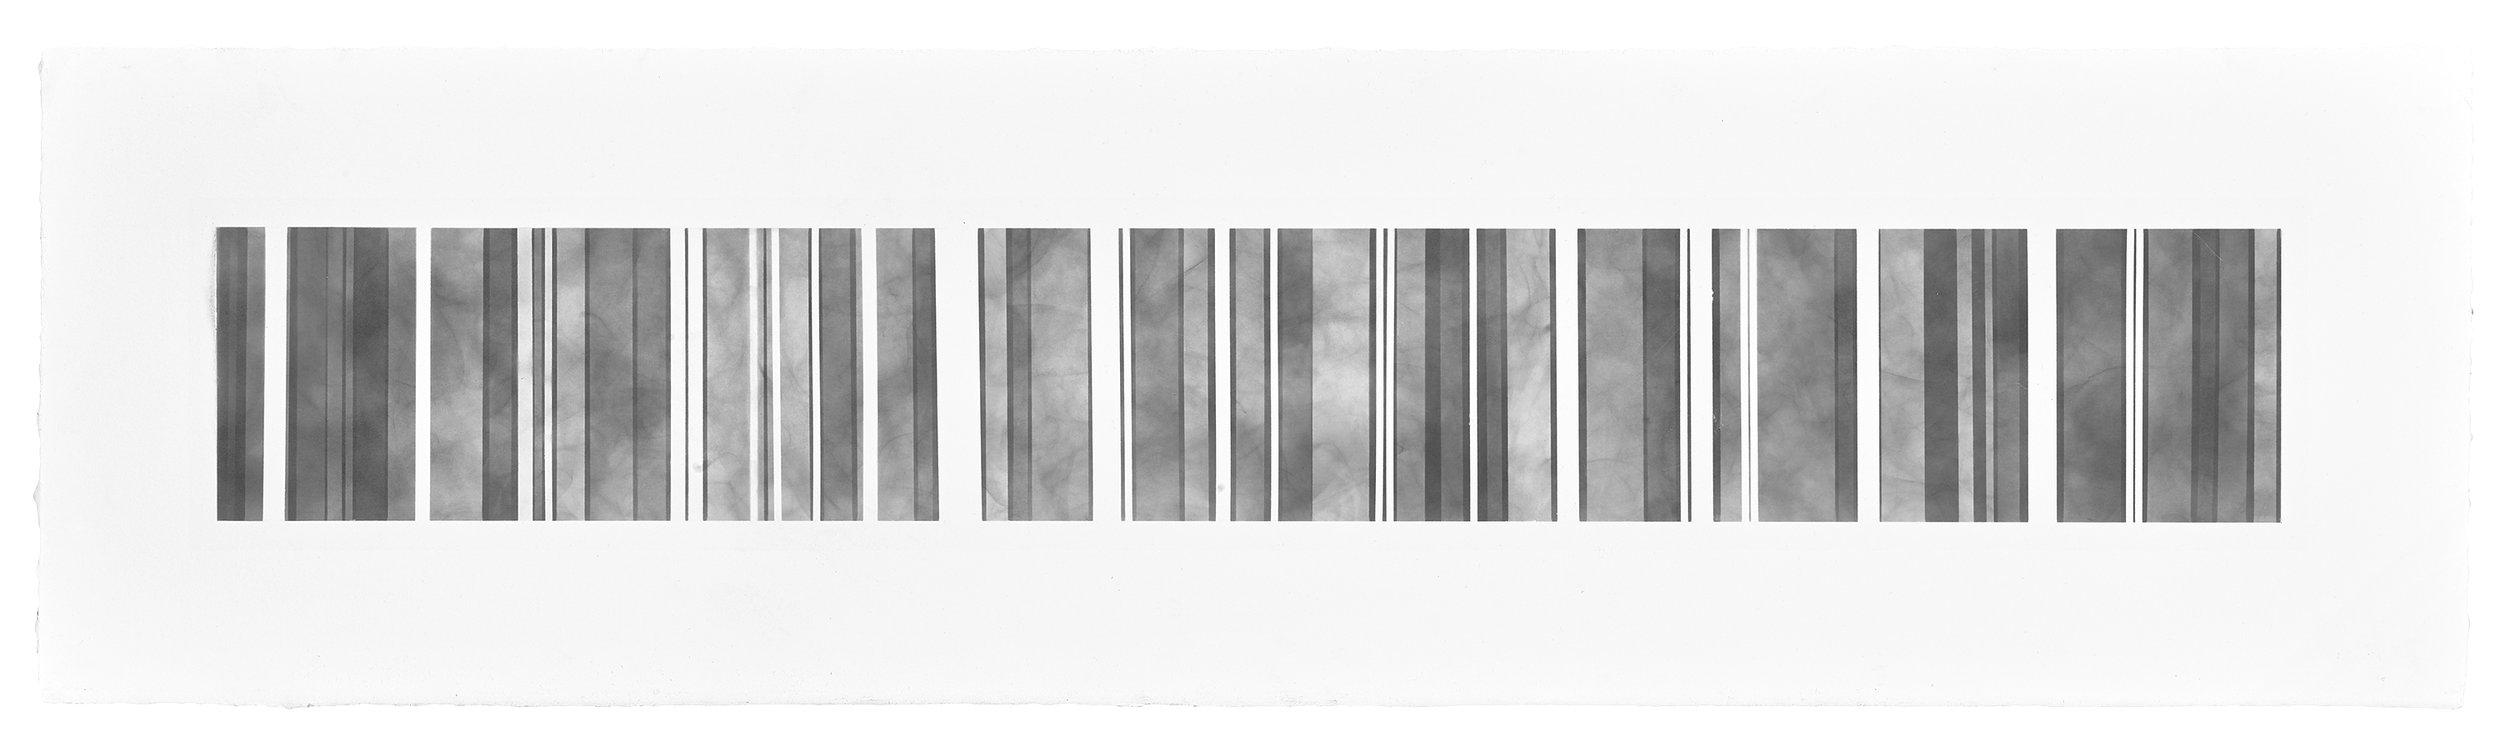 Barcode Series D, 5, 2018 copy.jpg